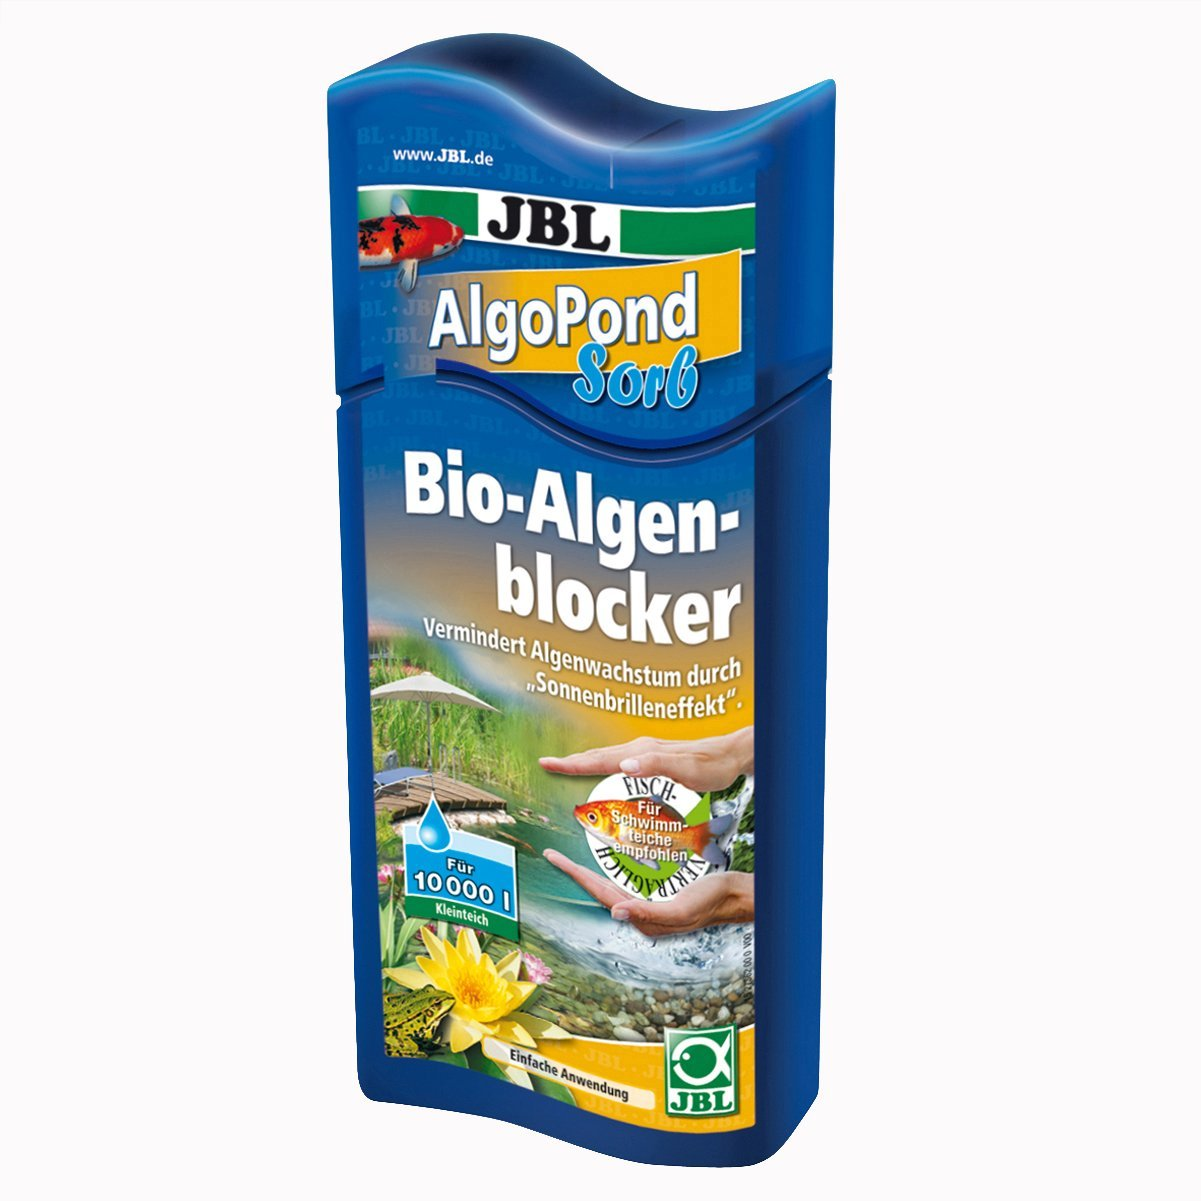 JBL Biologico Alghe Blocker per Laghetto, algopond Sorb